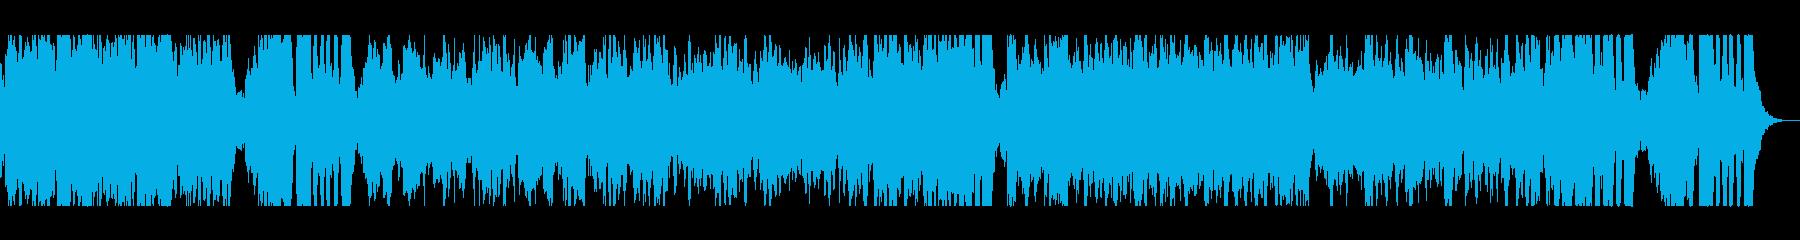 RPGのOPのような壮大な感じの曲の再生済みの波形